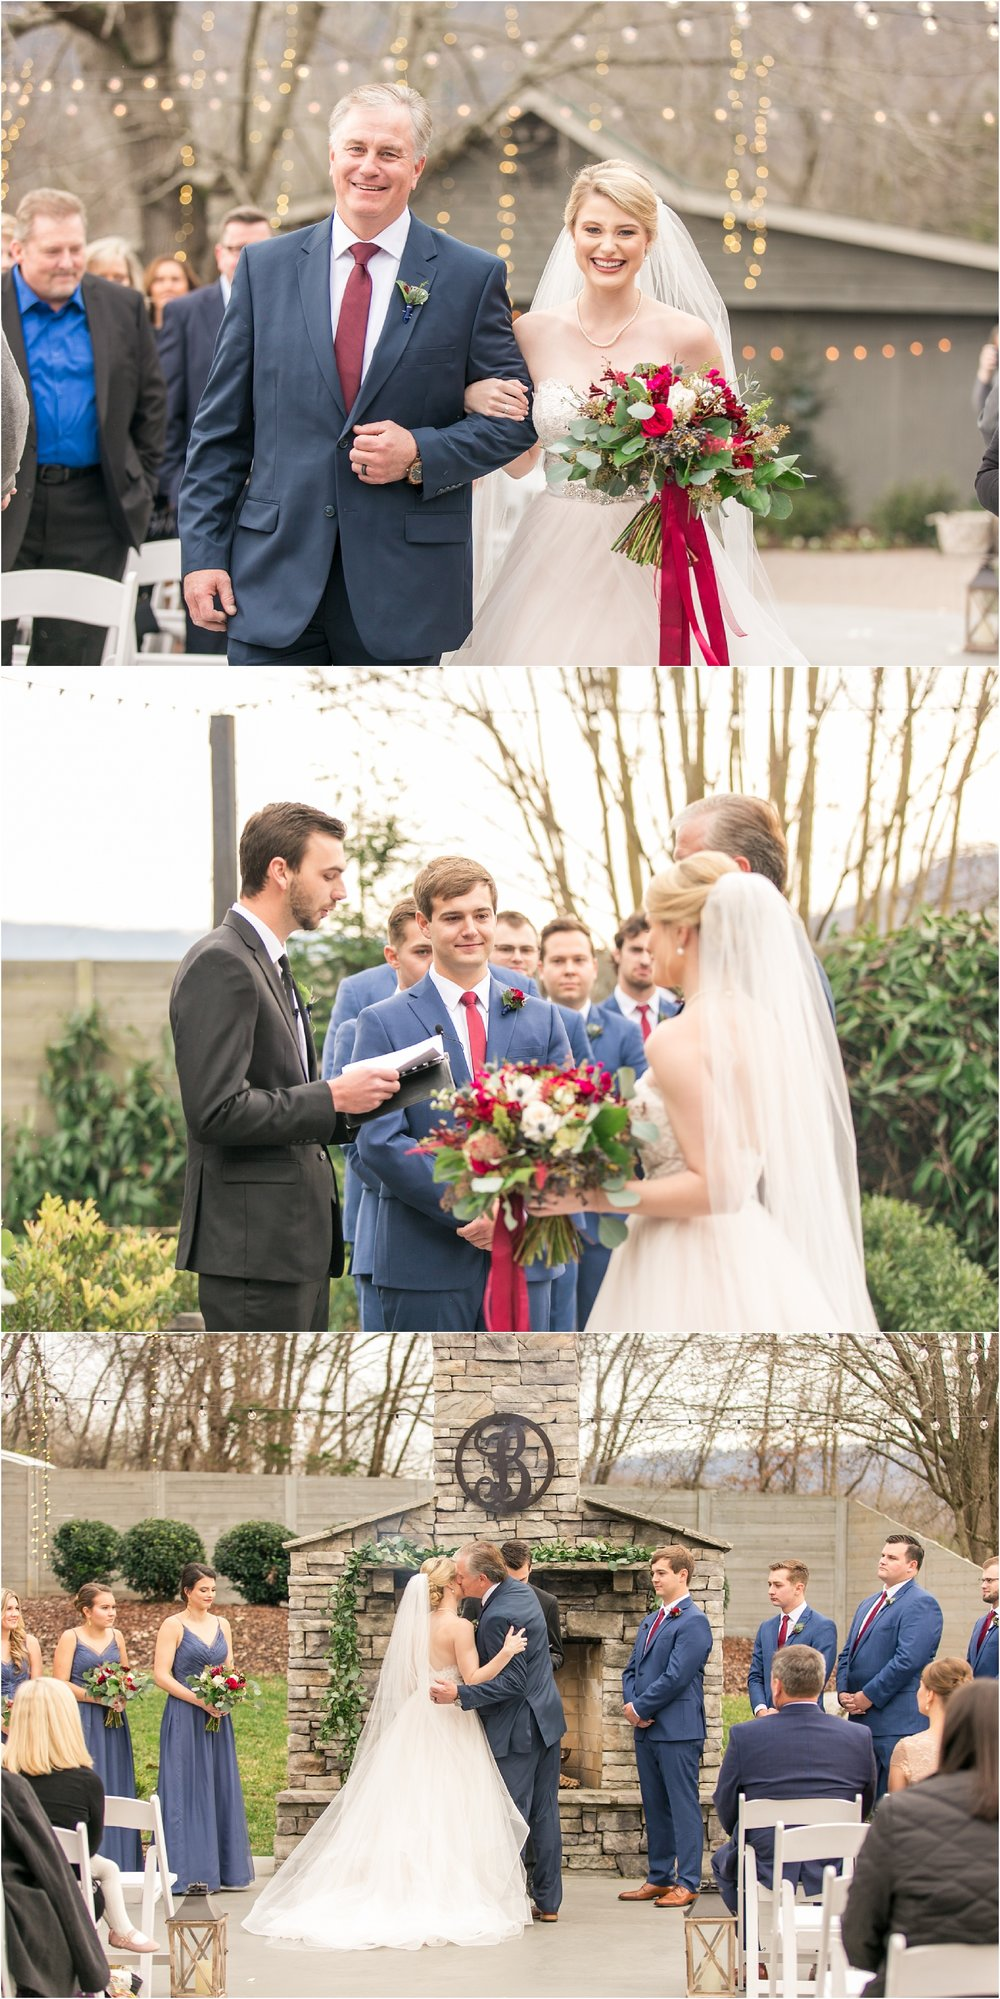 Savannah Eve Photography- Brandon-Brown Wedding-53.jpg